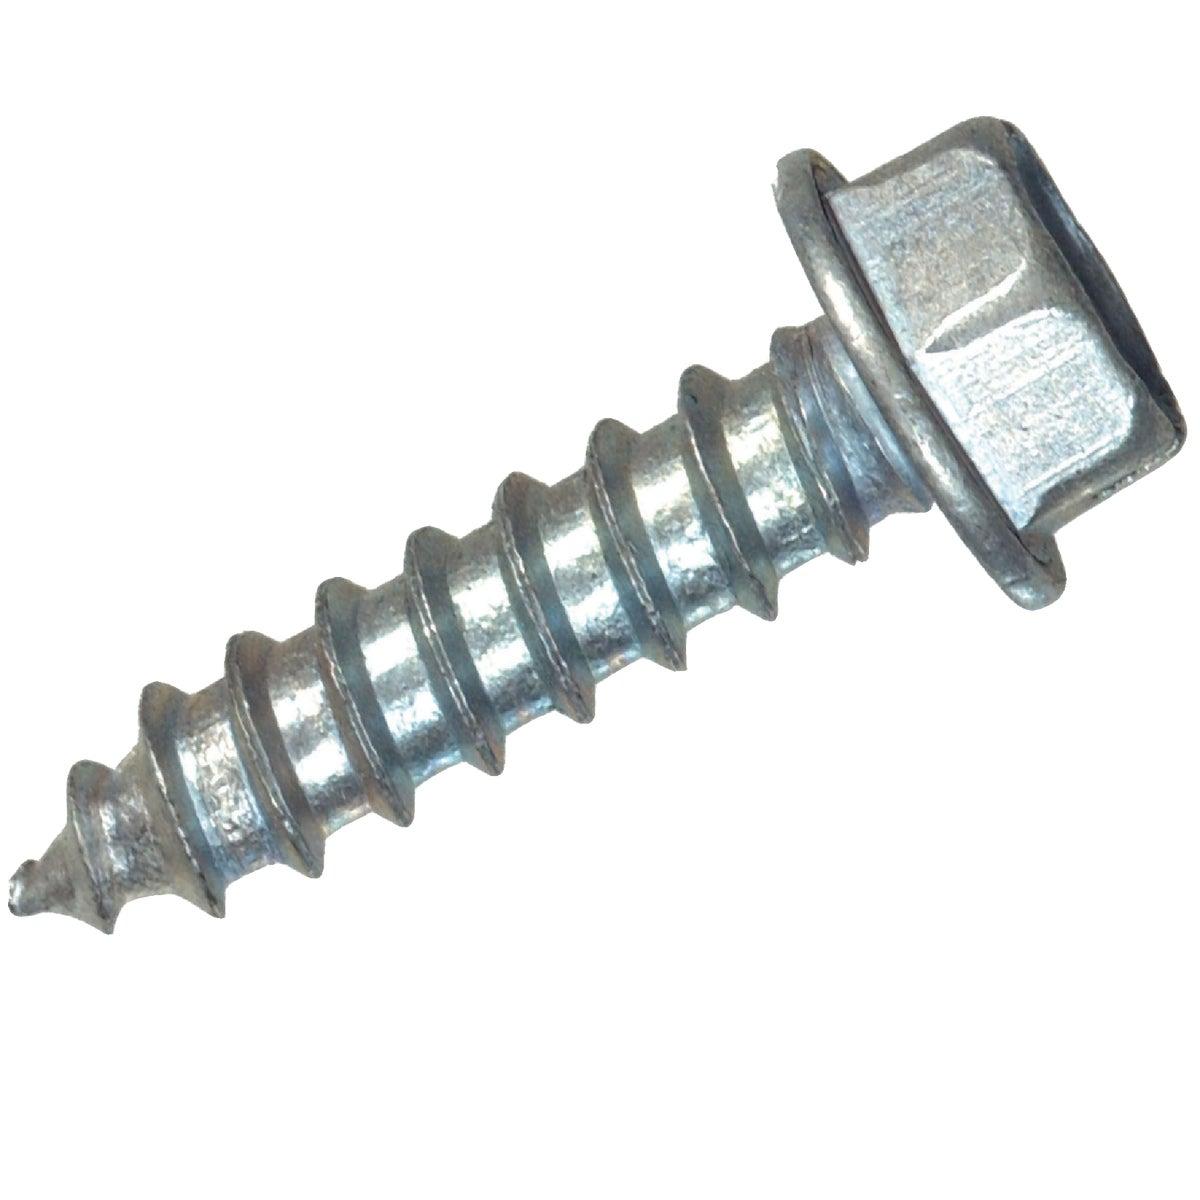 #10X1/2 Sht Metal Screw